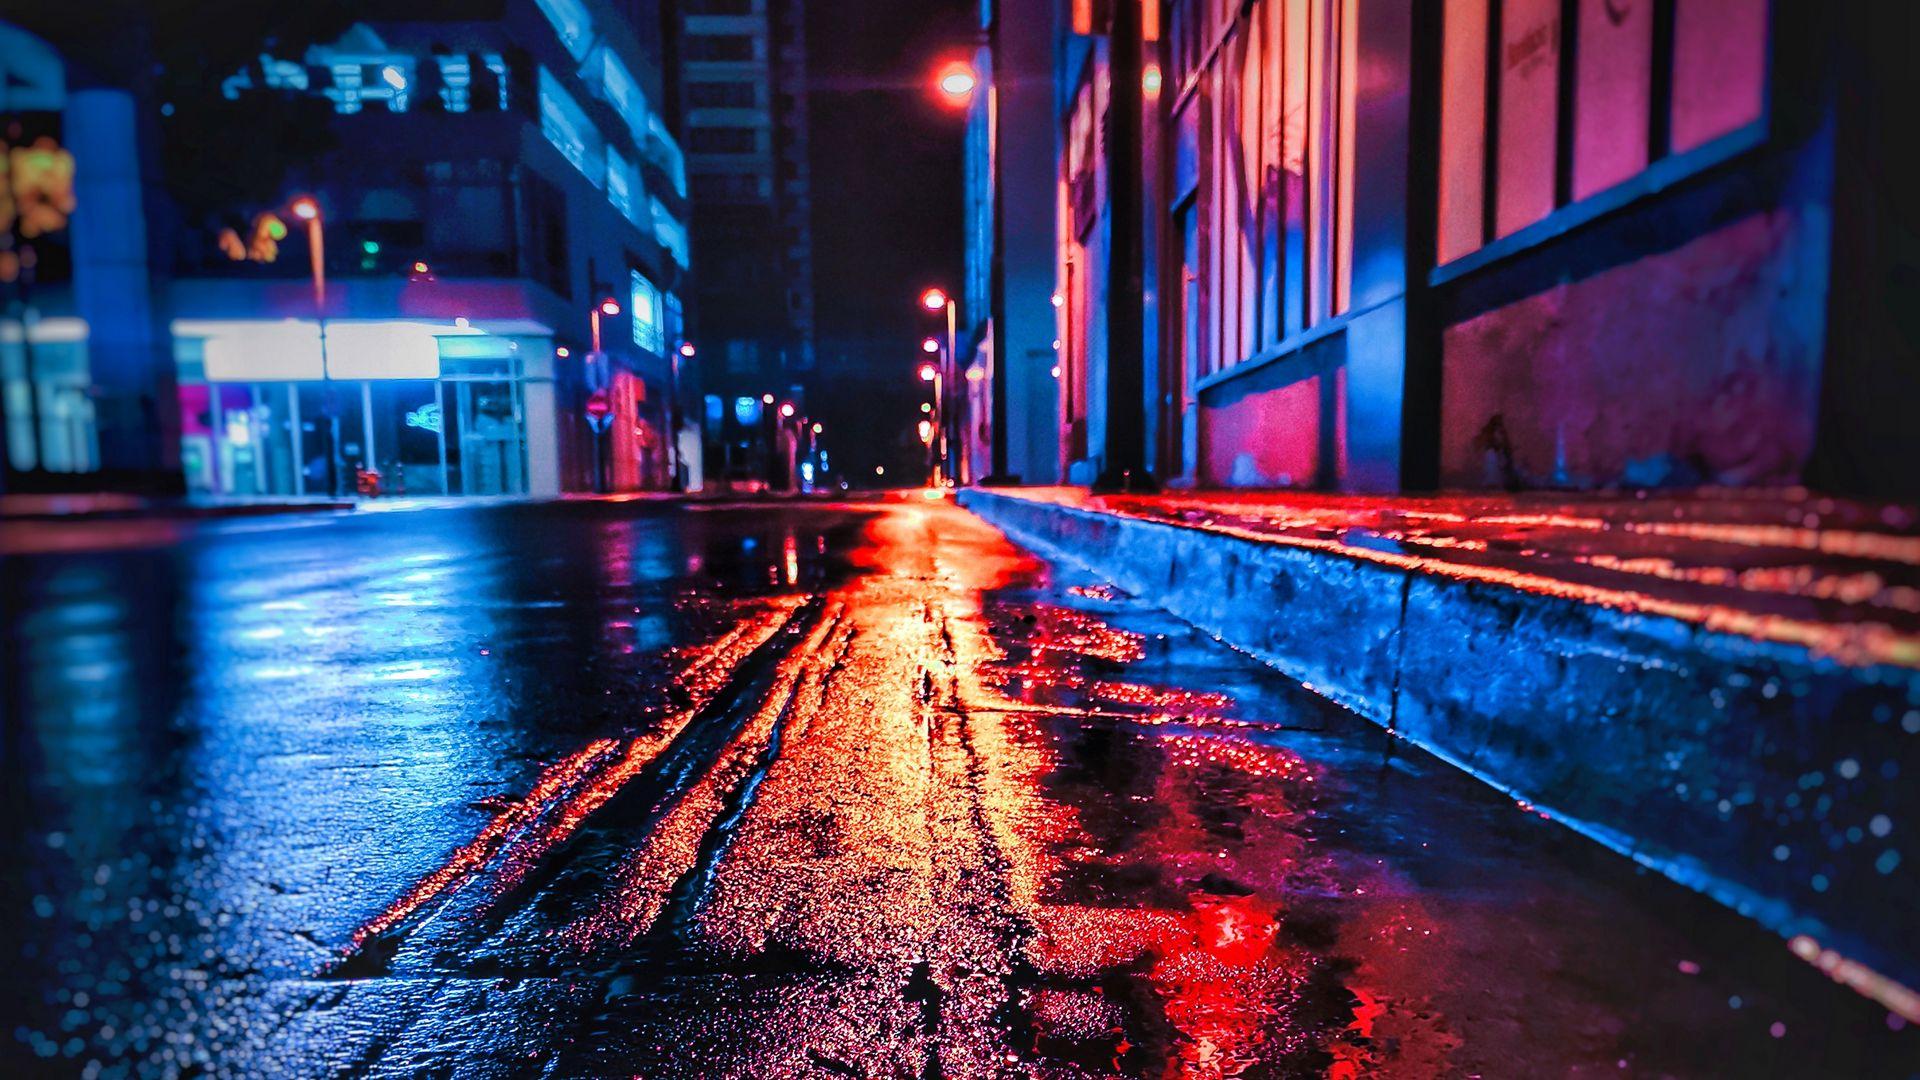 Download wallpaper 1920x1080 street, night, wet, neon, city full hd, hdtv, fhd, 1080p hd background